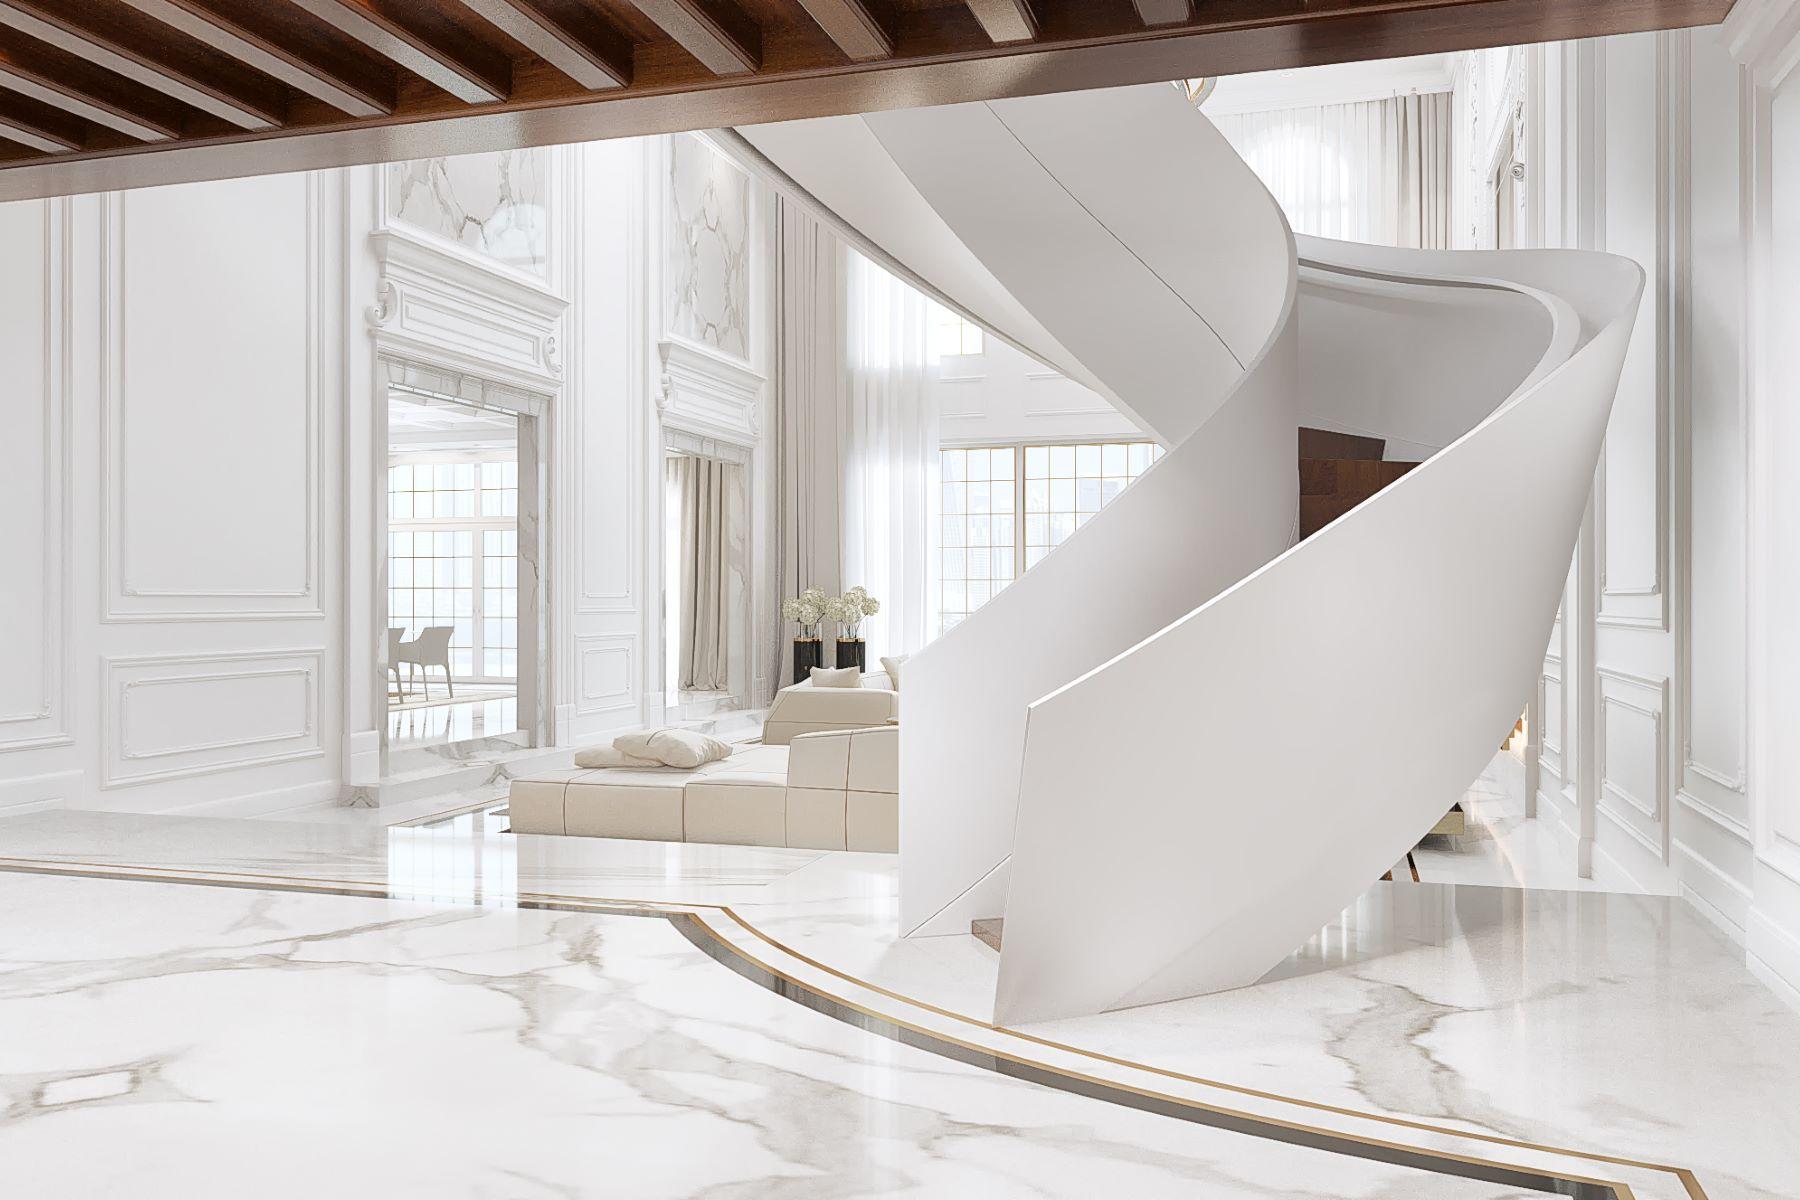 Single Family Homes for Sale at XXII Club Villas Other Dubai, Dubai United Arab Emirates